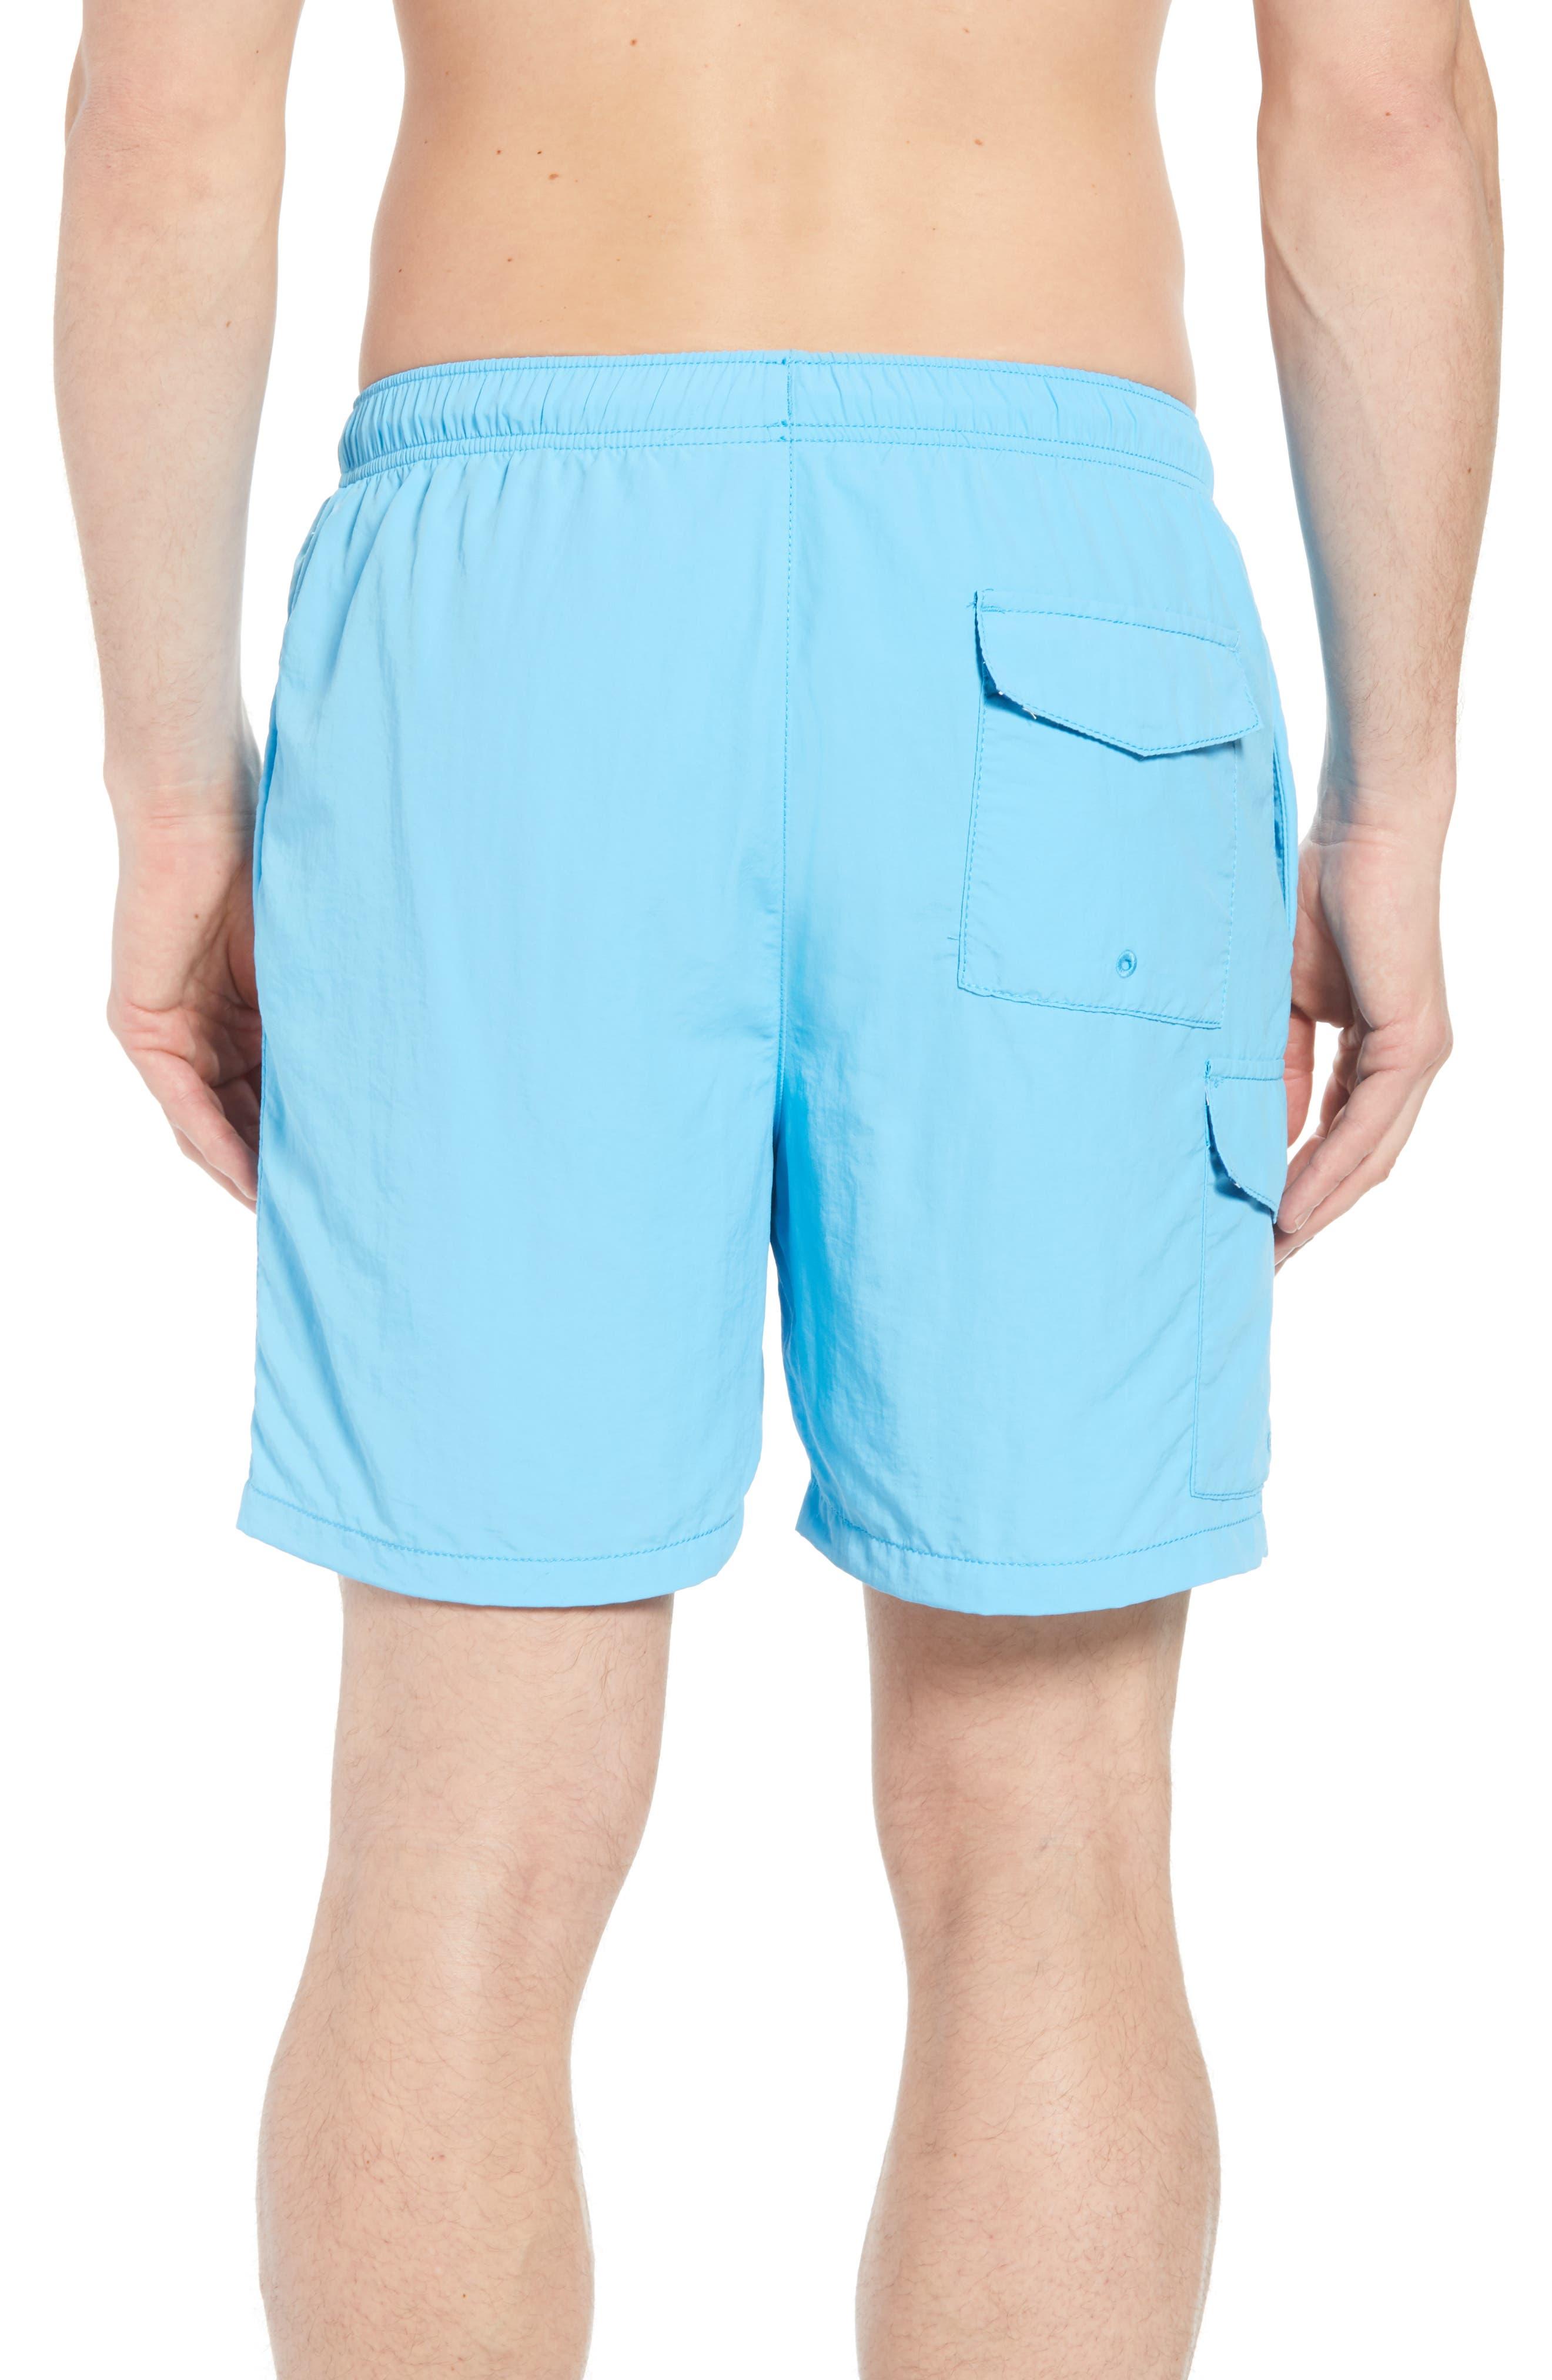 Naples Coast Swim Trunks,                             Alternate thumbnail 2, color,                             Breeze Blue